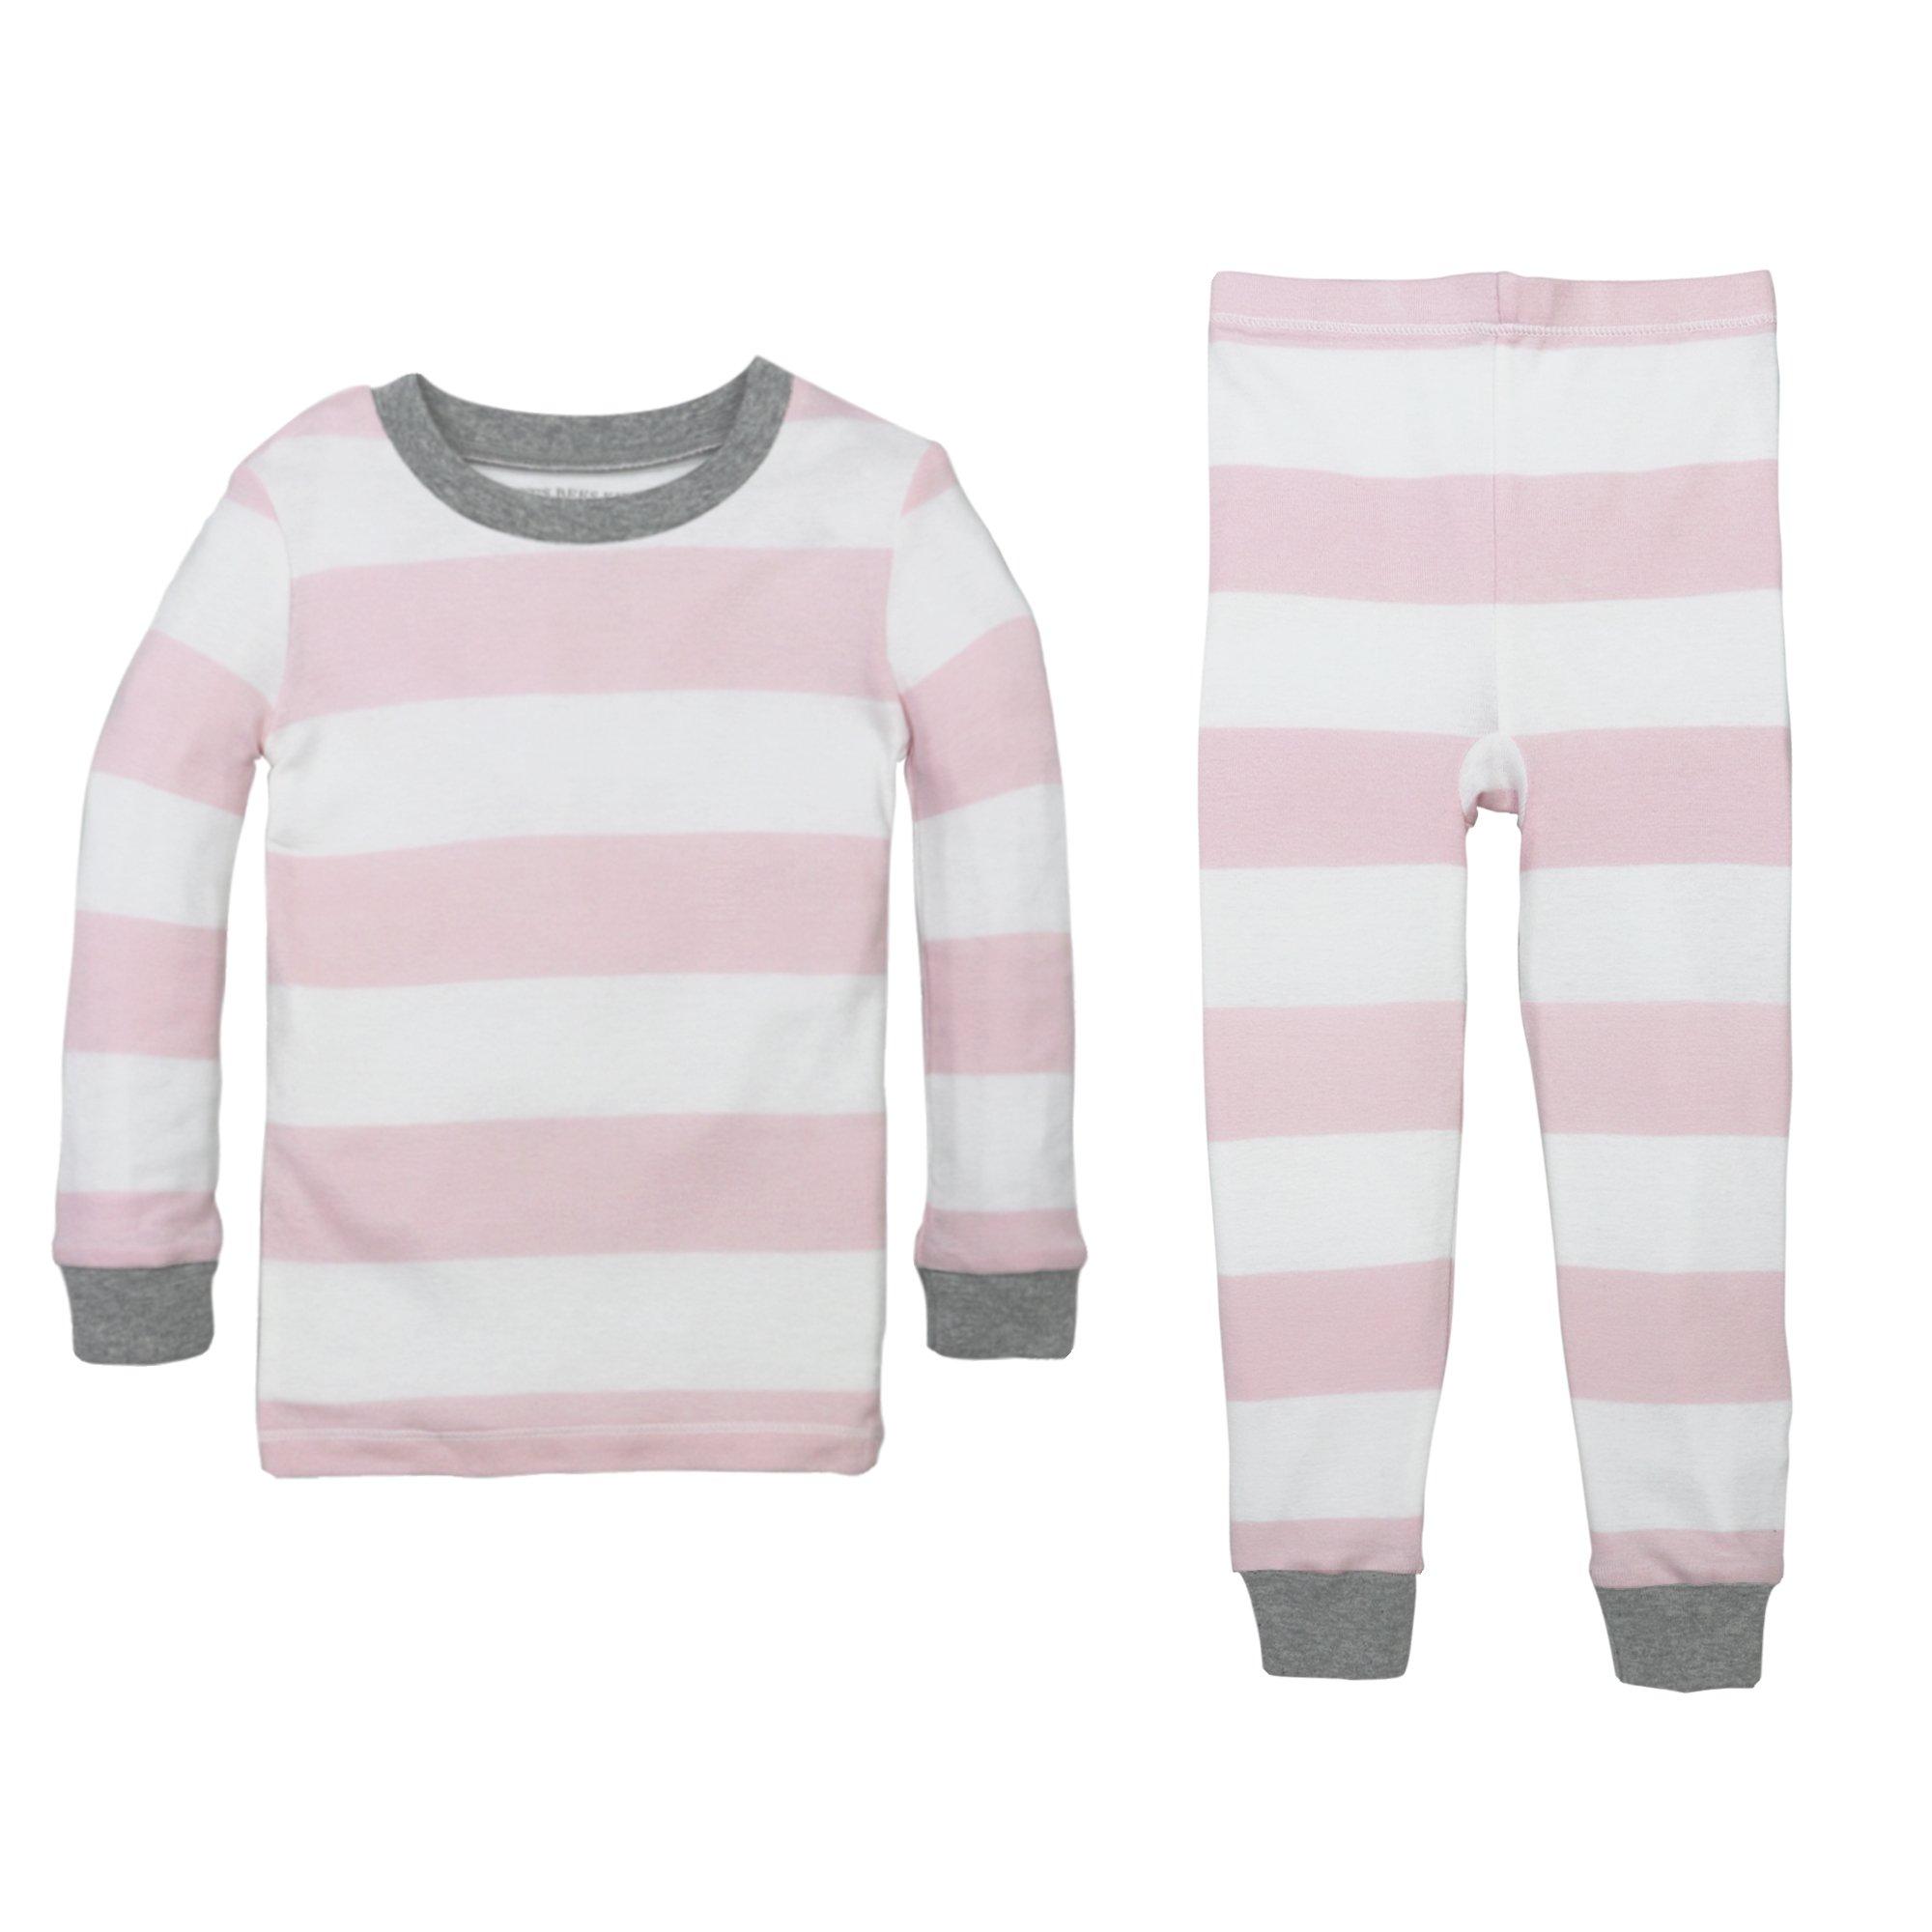 Burt's Bees Baby Unisex Pajamas, 2-Piece PJ Set, 100% Organic Cotton (12 Mo-7 Yrs), Blossom Rugby Stripe Months